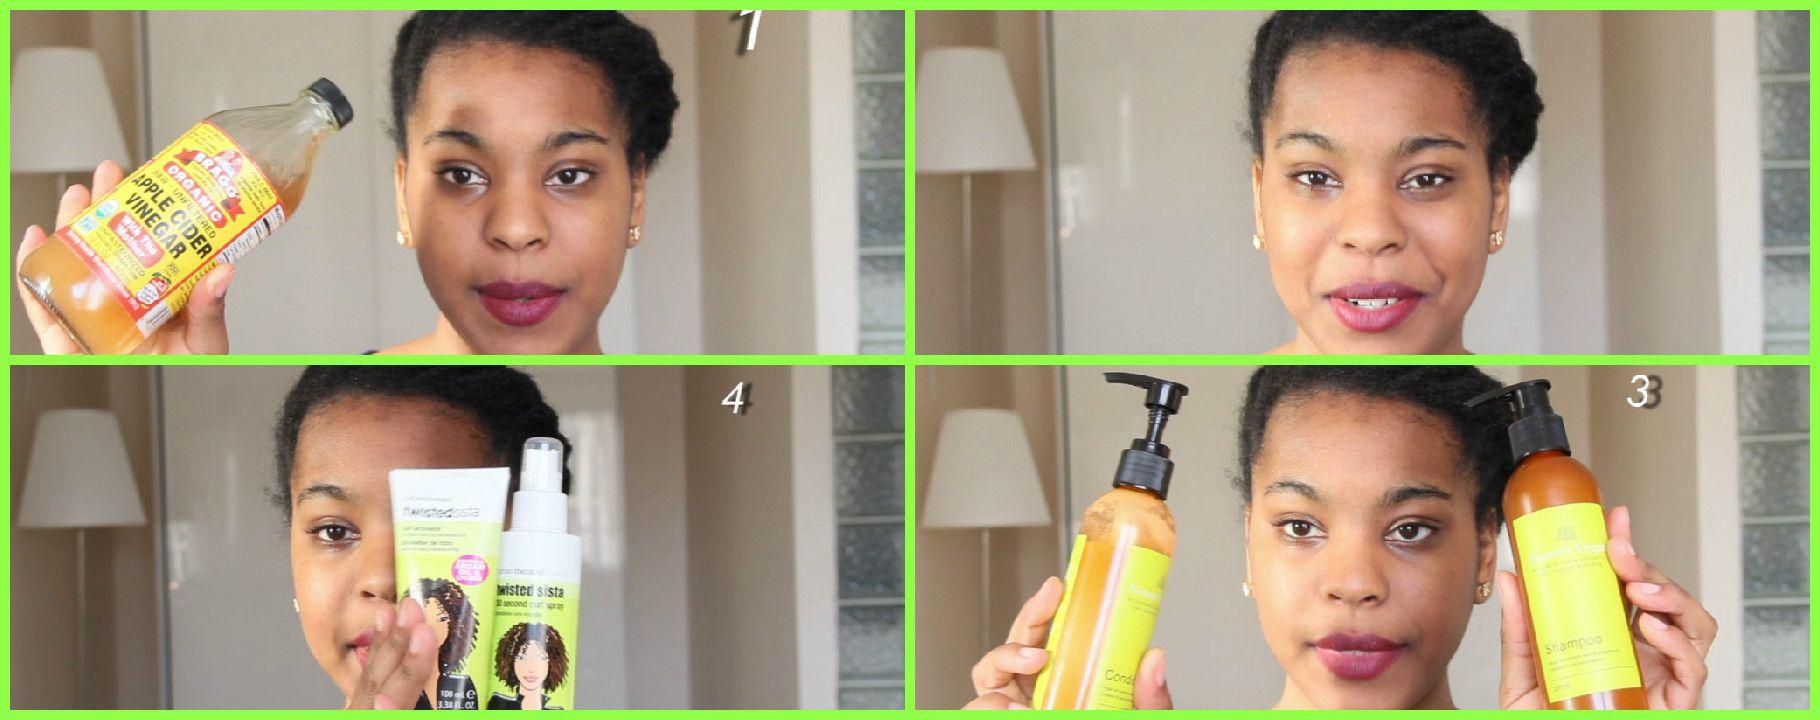 Hauls Produits Cheveux Naturels ! Lien de la vidéo : https://www.youtube.com/watch?v=OSoWuCtykFQ&list=UUJwxZHwtHIwbowlvl8fi5oA